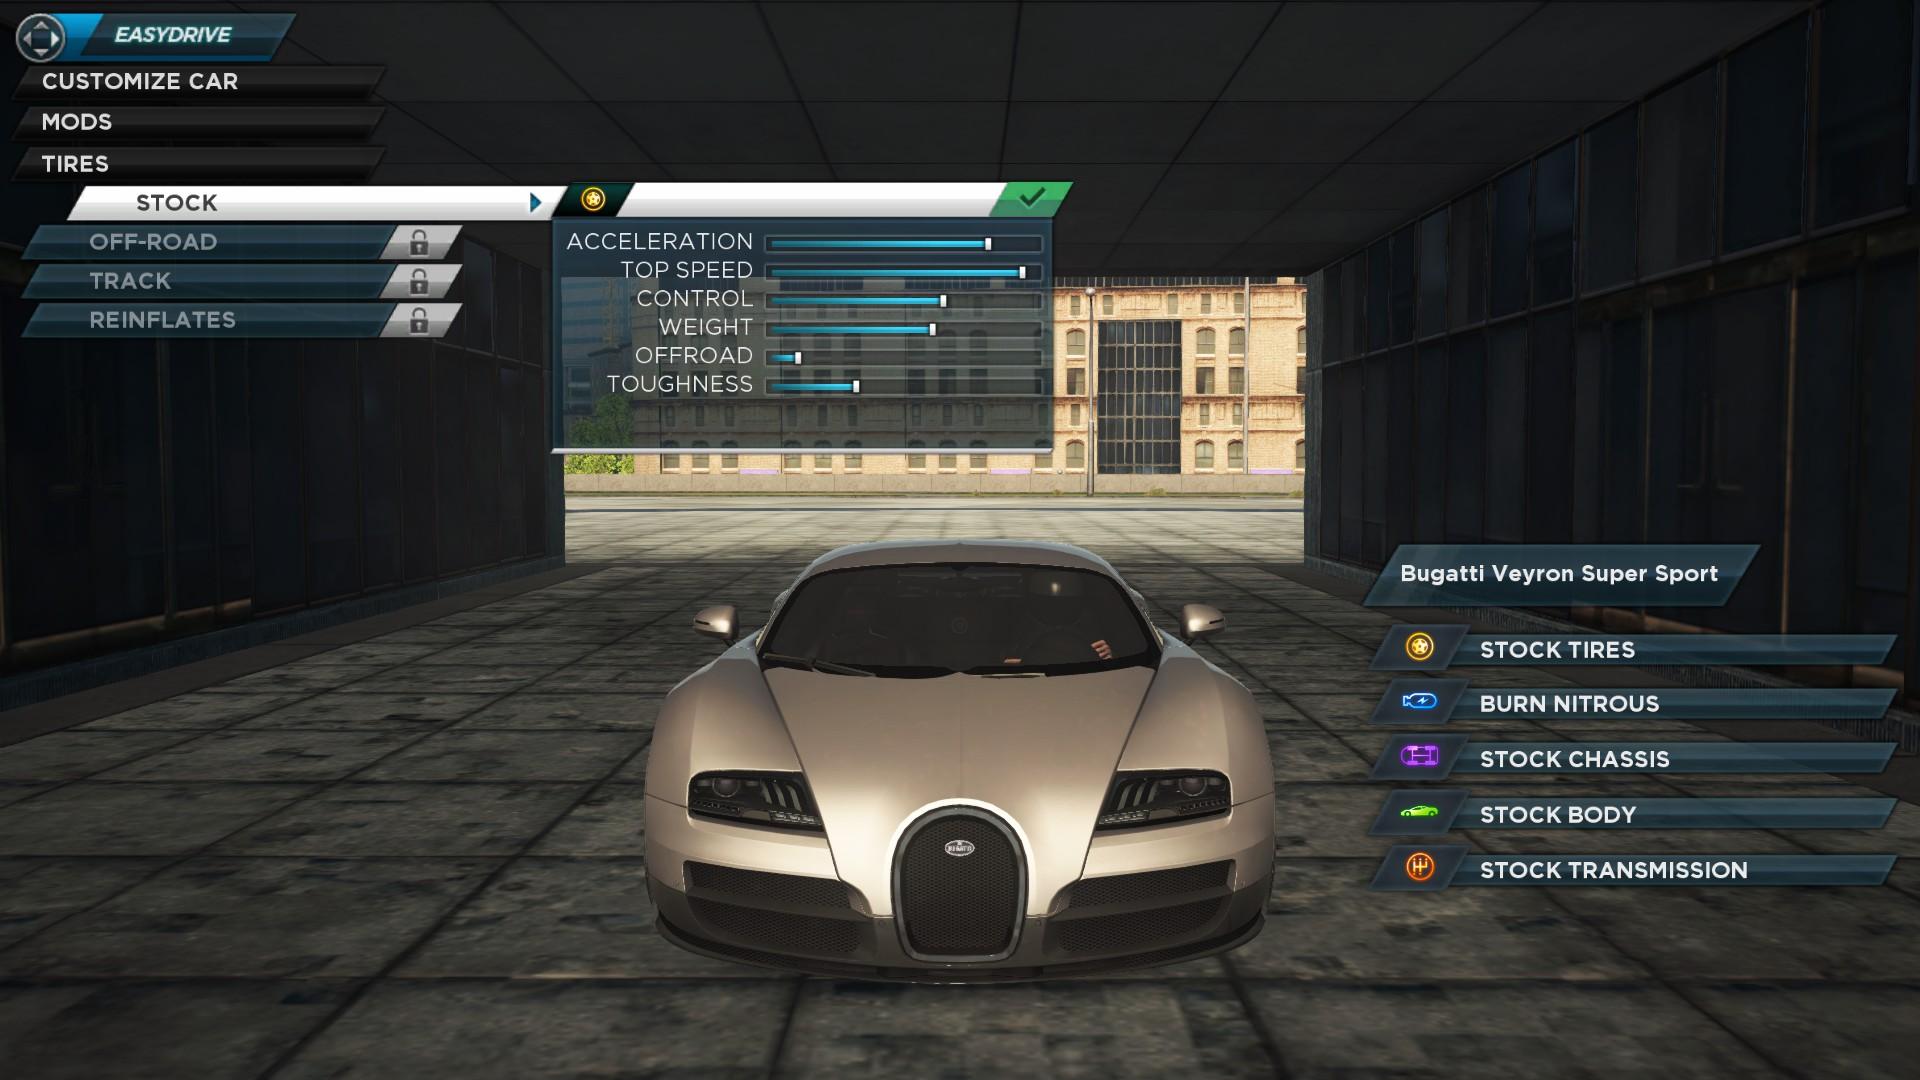 d737f069-159a-404a-9273-c43078402b38 Wonderful Bugatti Veyron Xbox 360 Games Cars Trend